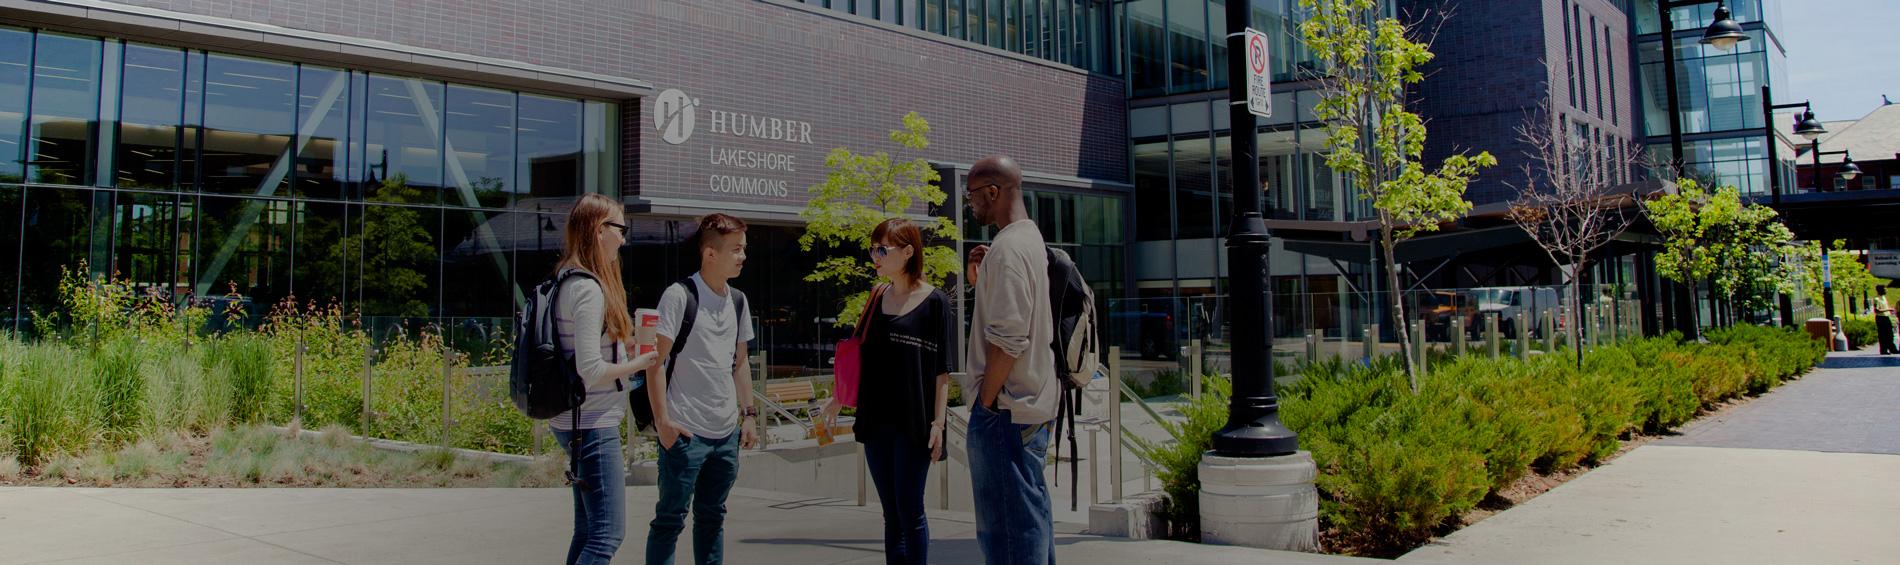 Презентация «Образование в Канаде – карьера начинается с Humber College». Фото - 6